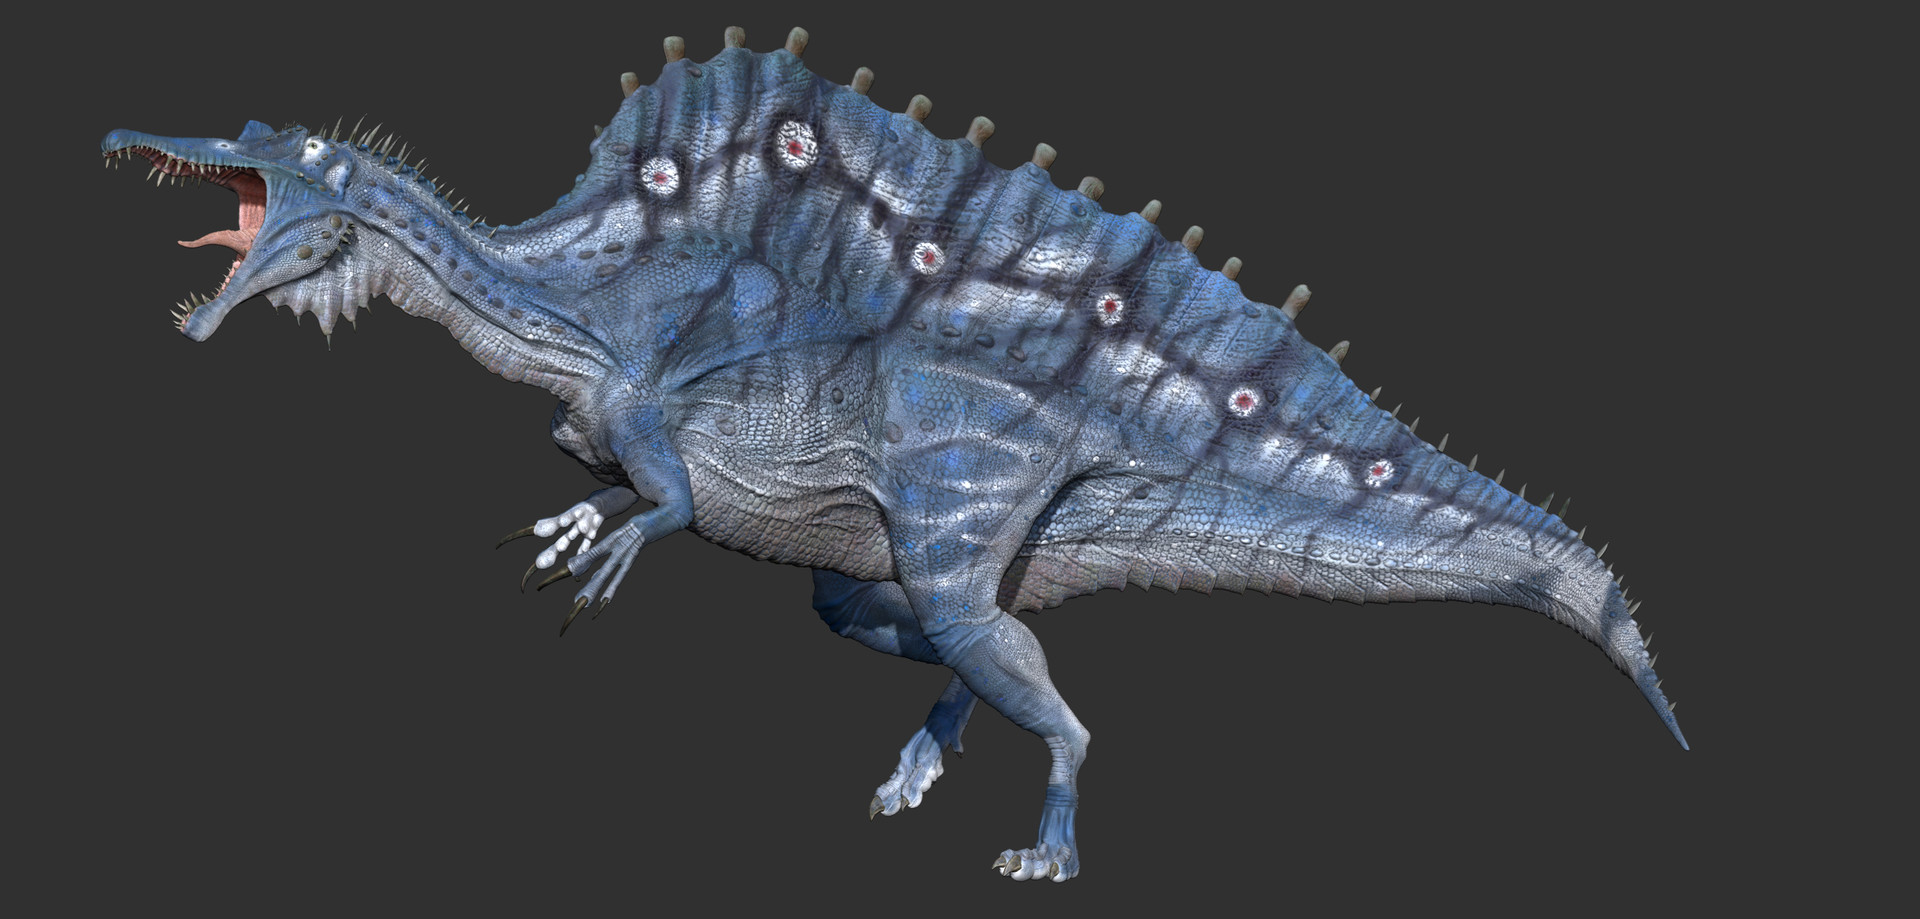 Vitamin Imagination Spinosaurus Concept02divdiv class